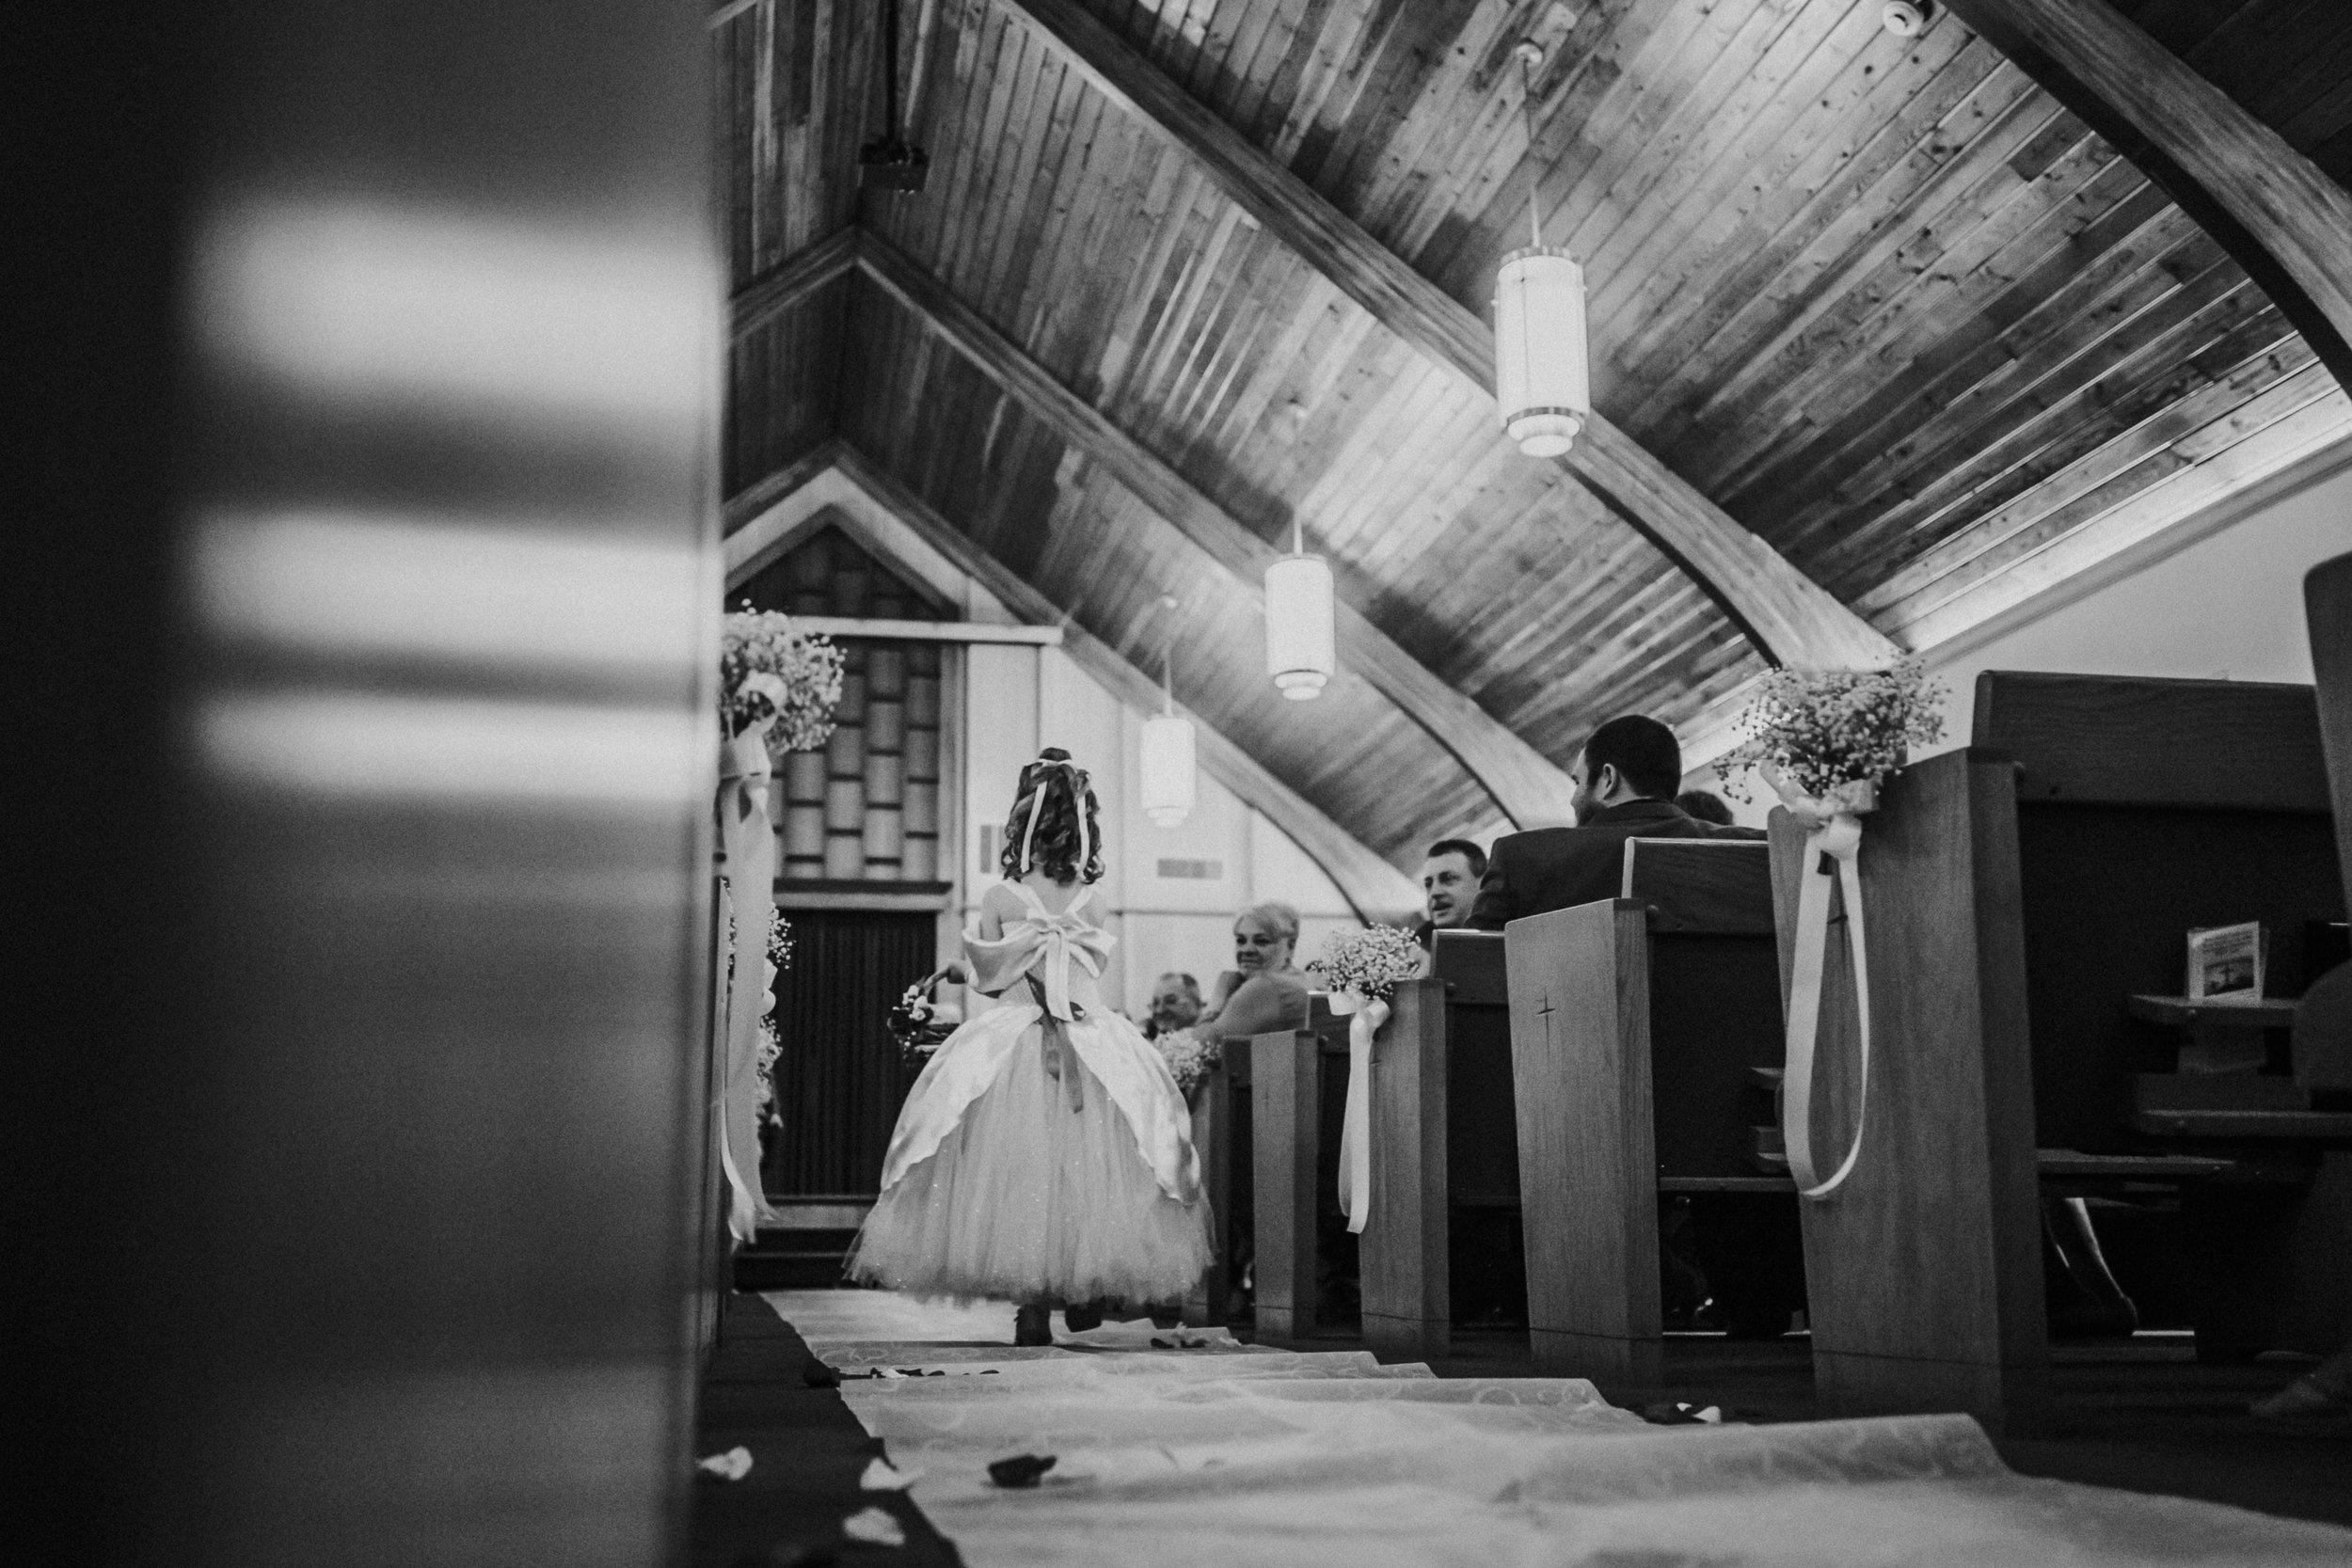 Barclay-Farmstead-Wedding-Rosa-and-Mike-221.jpg